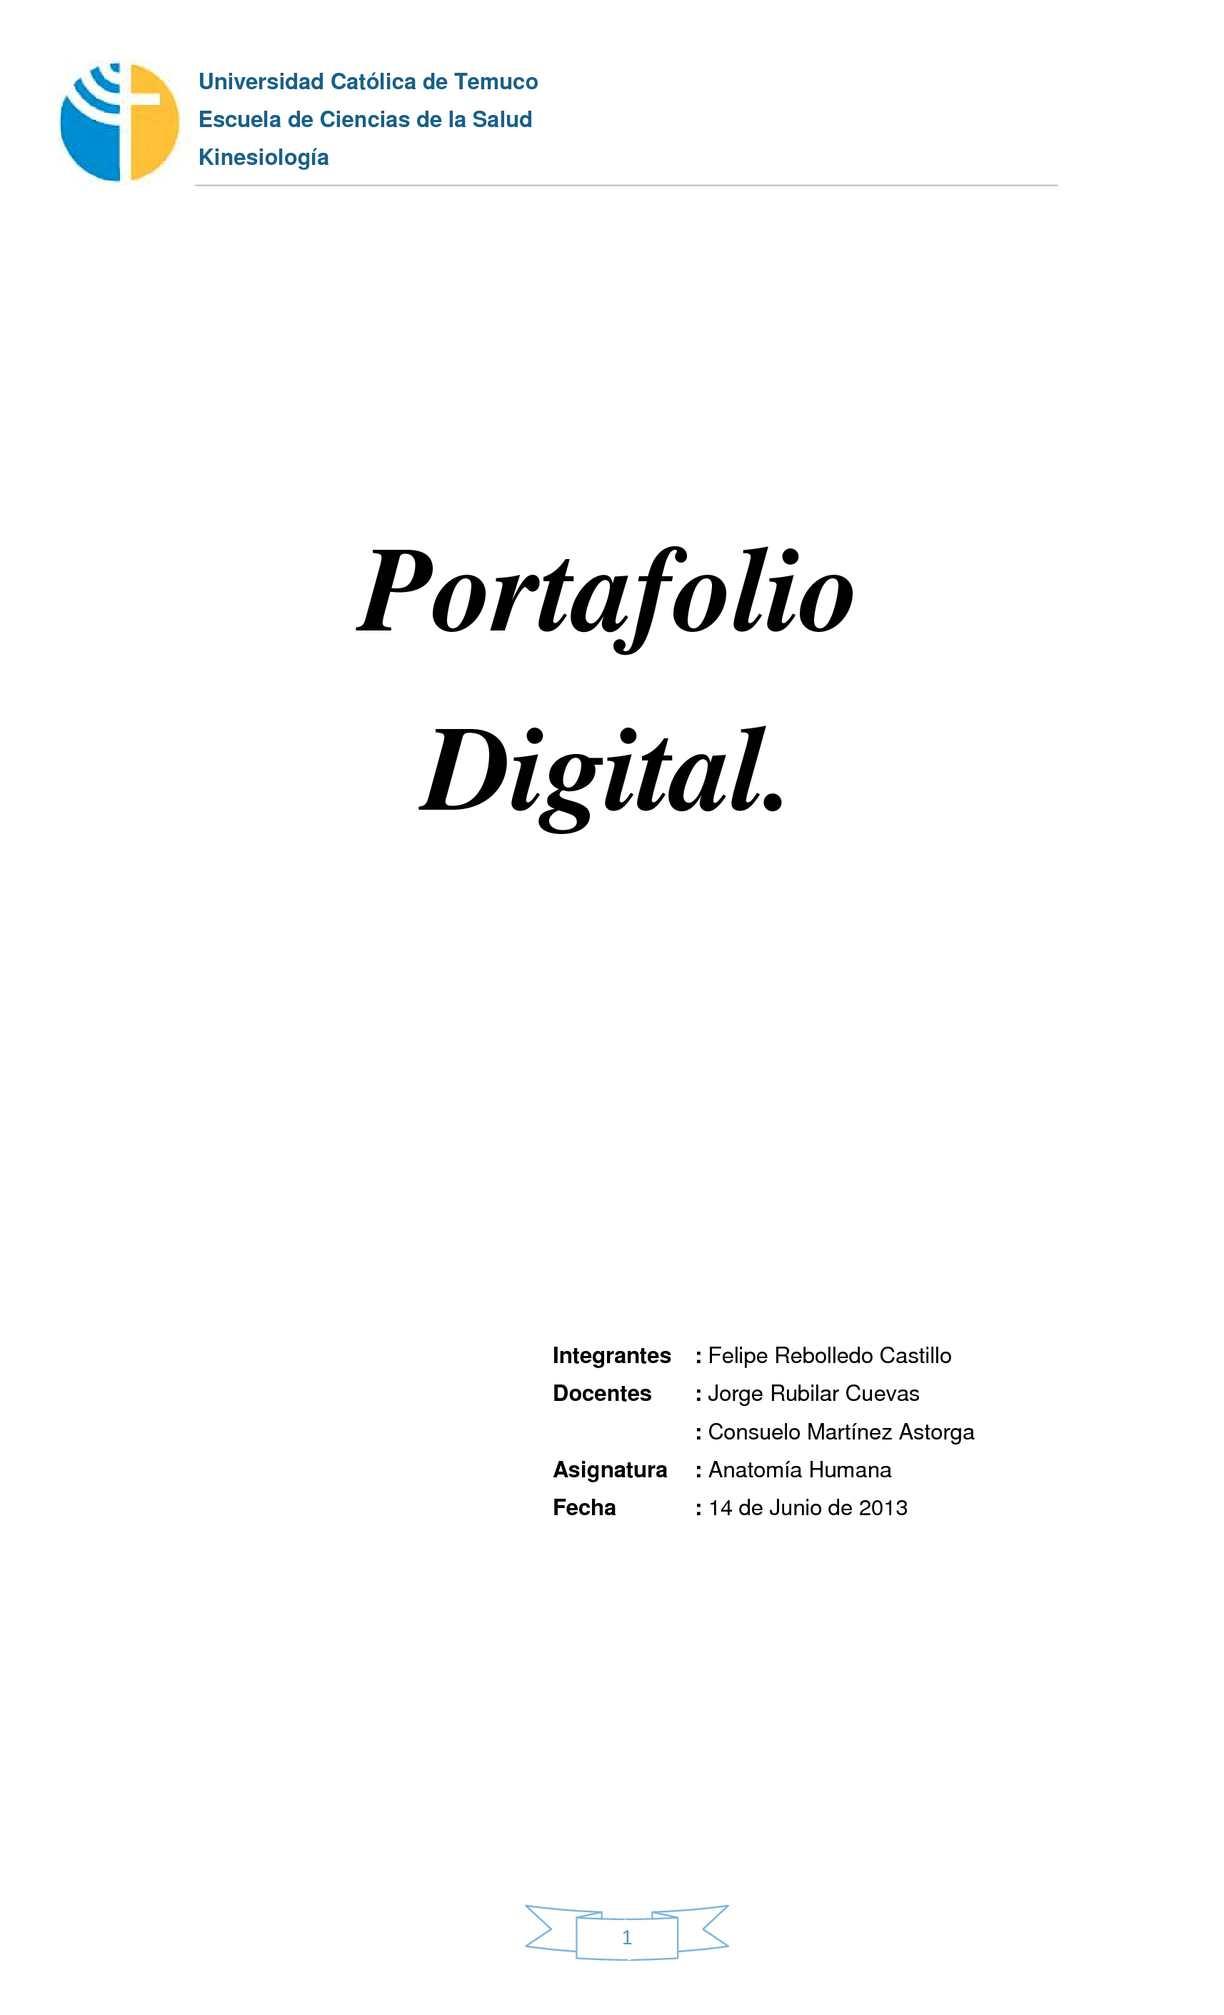 Calaméo - Portafolio Digital Anatomía Humana Kinesiología UCT